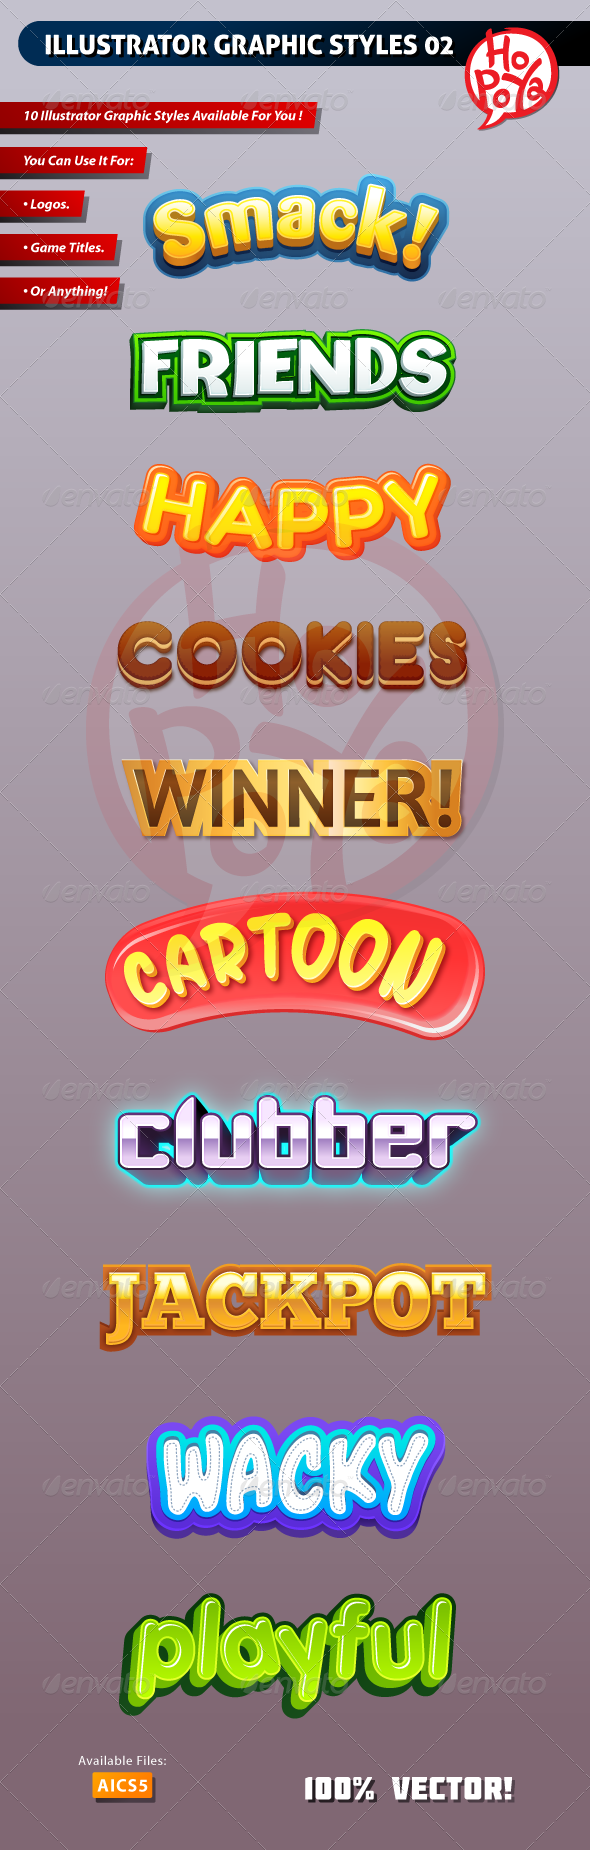 Illustrator Graphic Styles 02